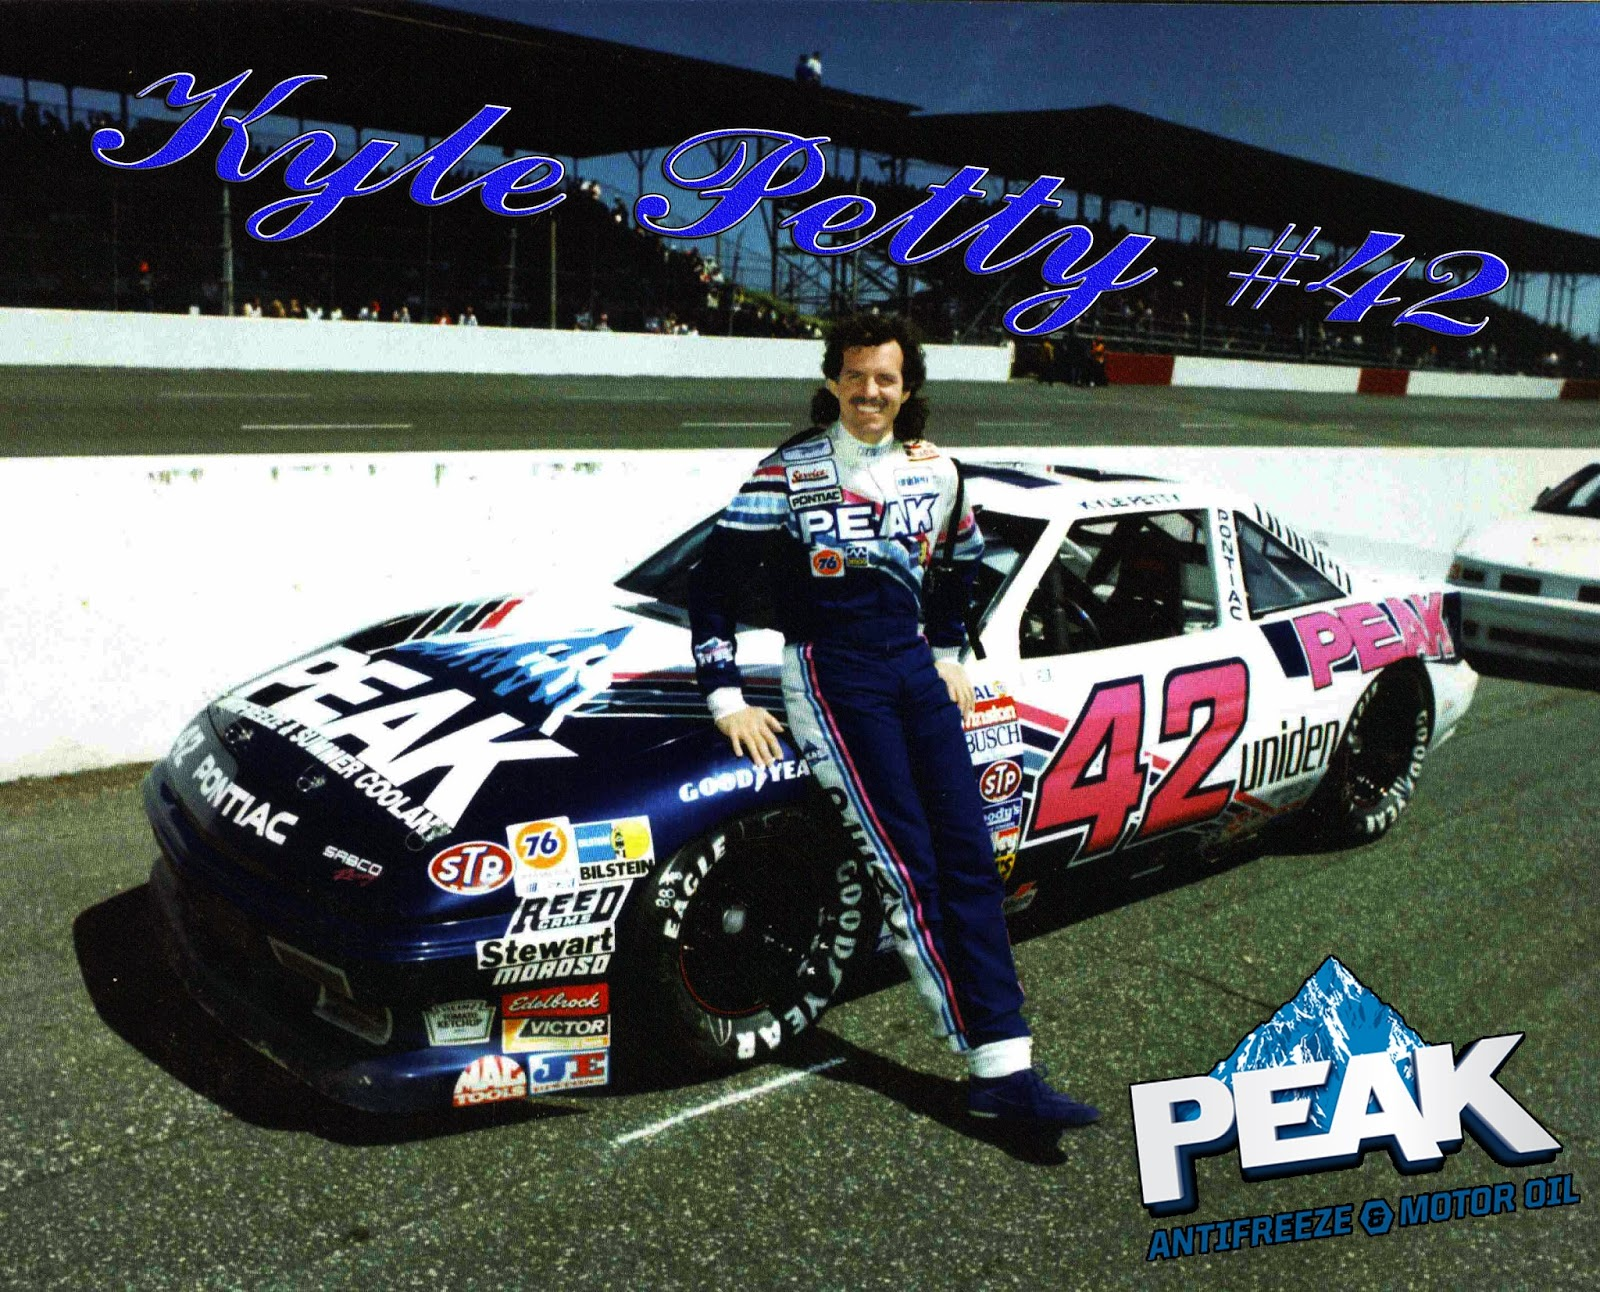 NASCAR Racing Champions Blog Kyle Petty 42 Peak Antifreeze